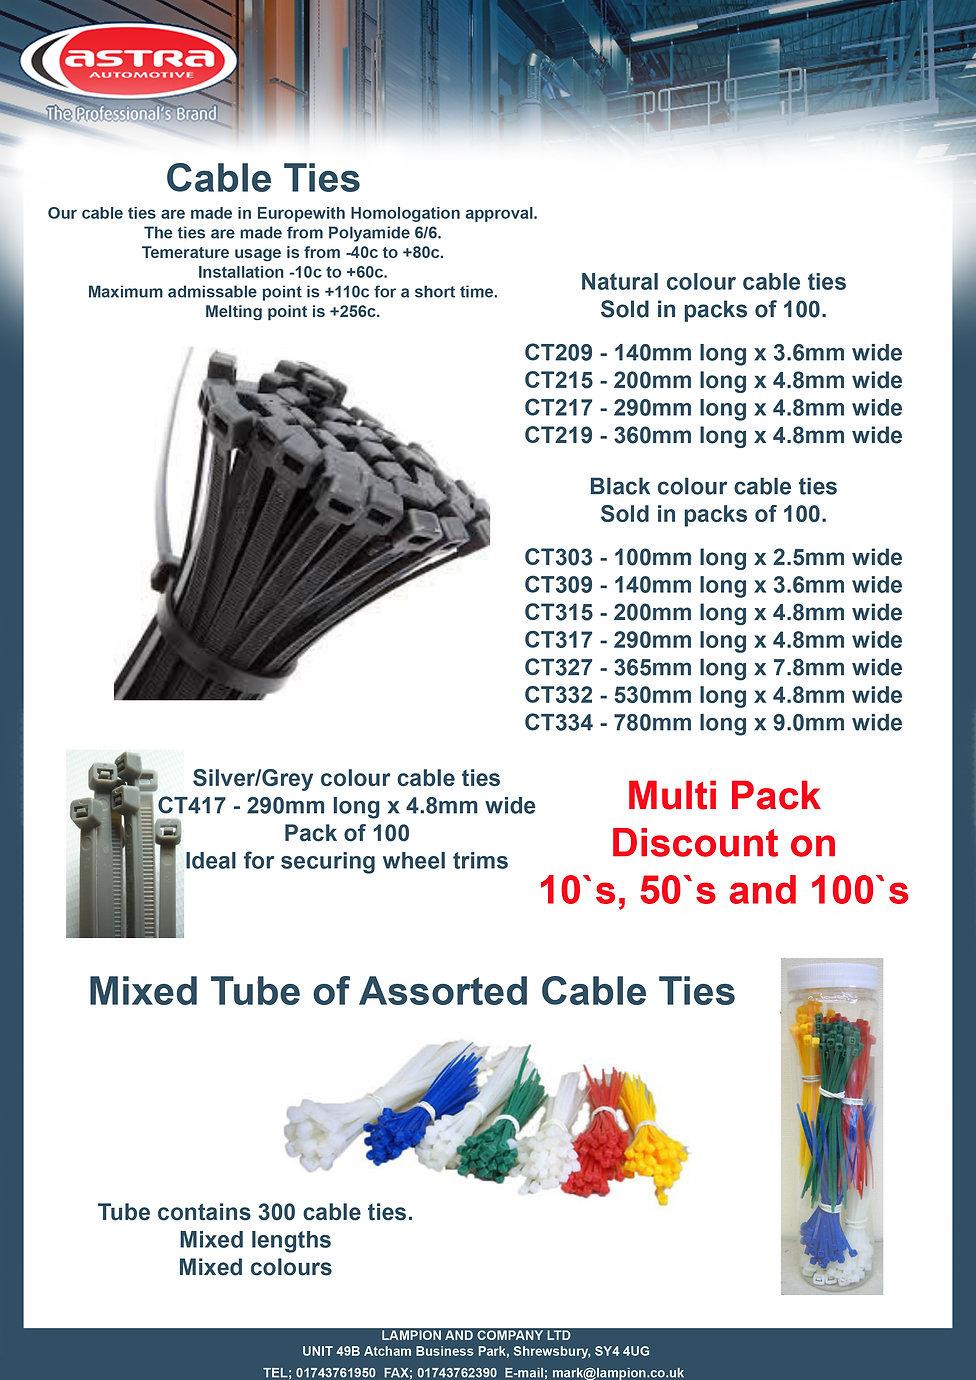 Cable ties copy.jpg